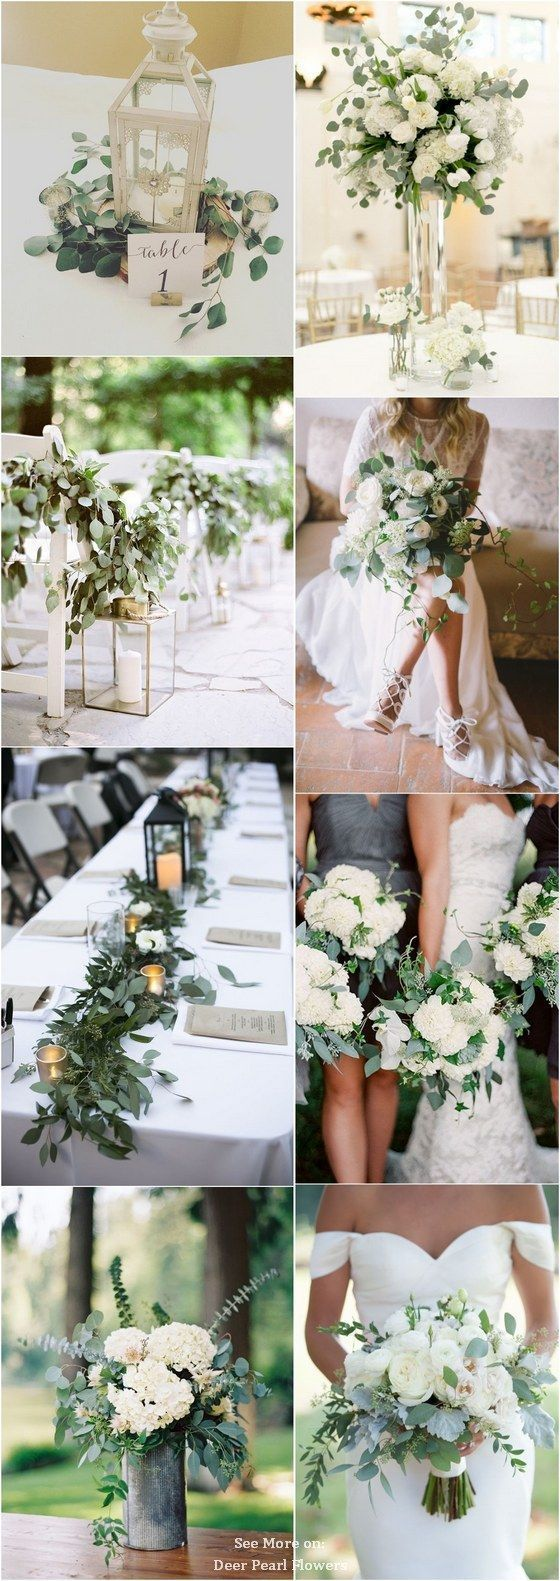 40 grüne Eukalyptus Hochzeit Dekor Ideen – Blum…